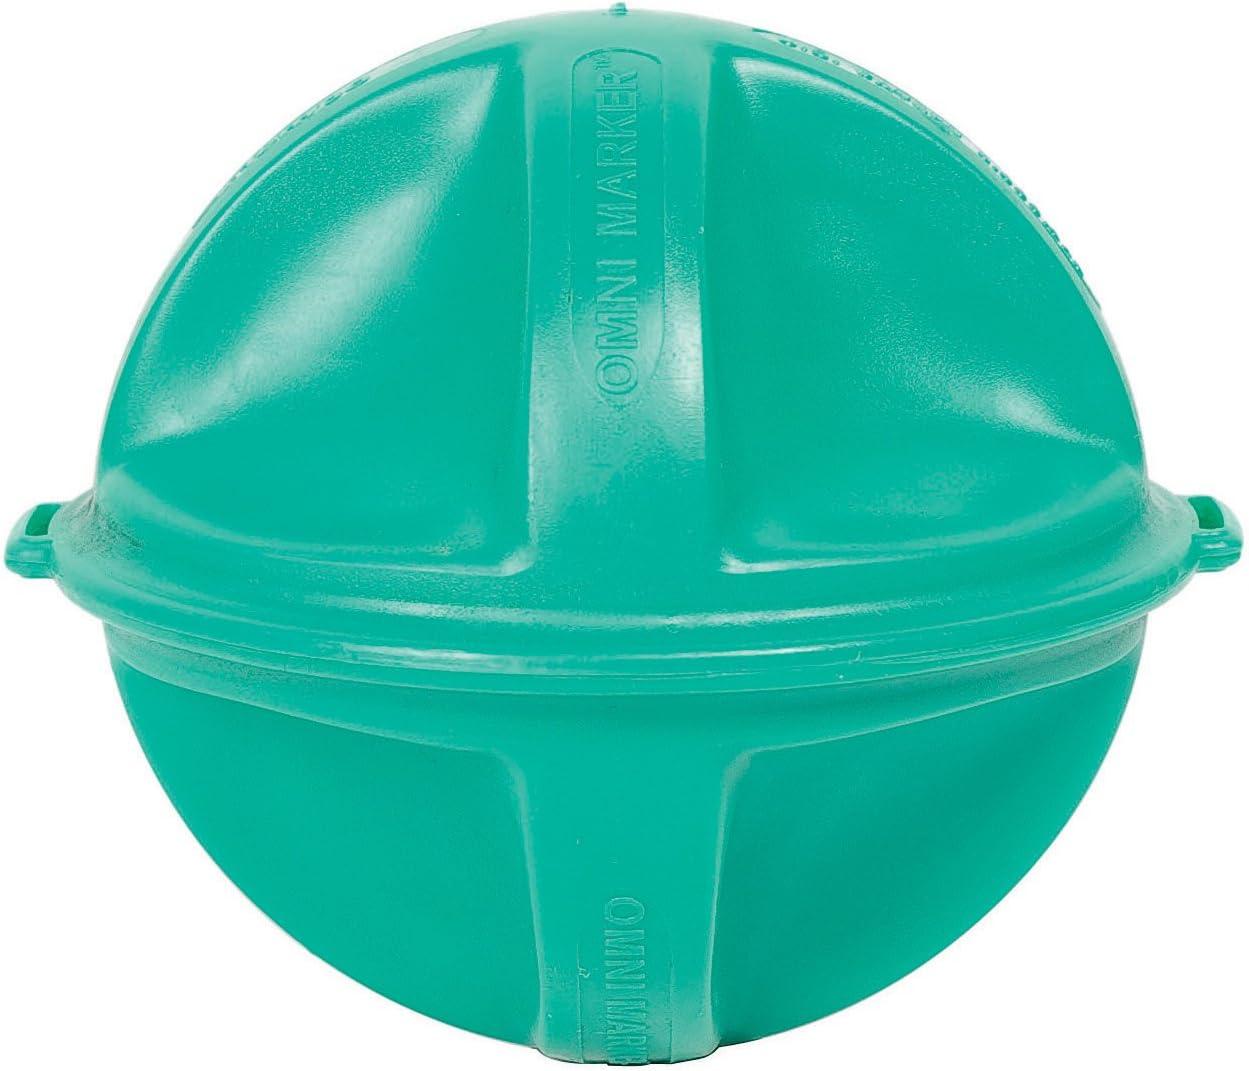 Greenlee 0162-0001-1 Omni Marker Buried Utility Marker Green Sanitary